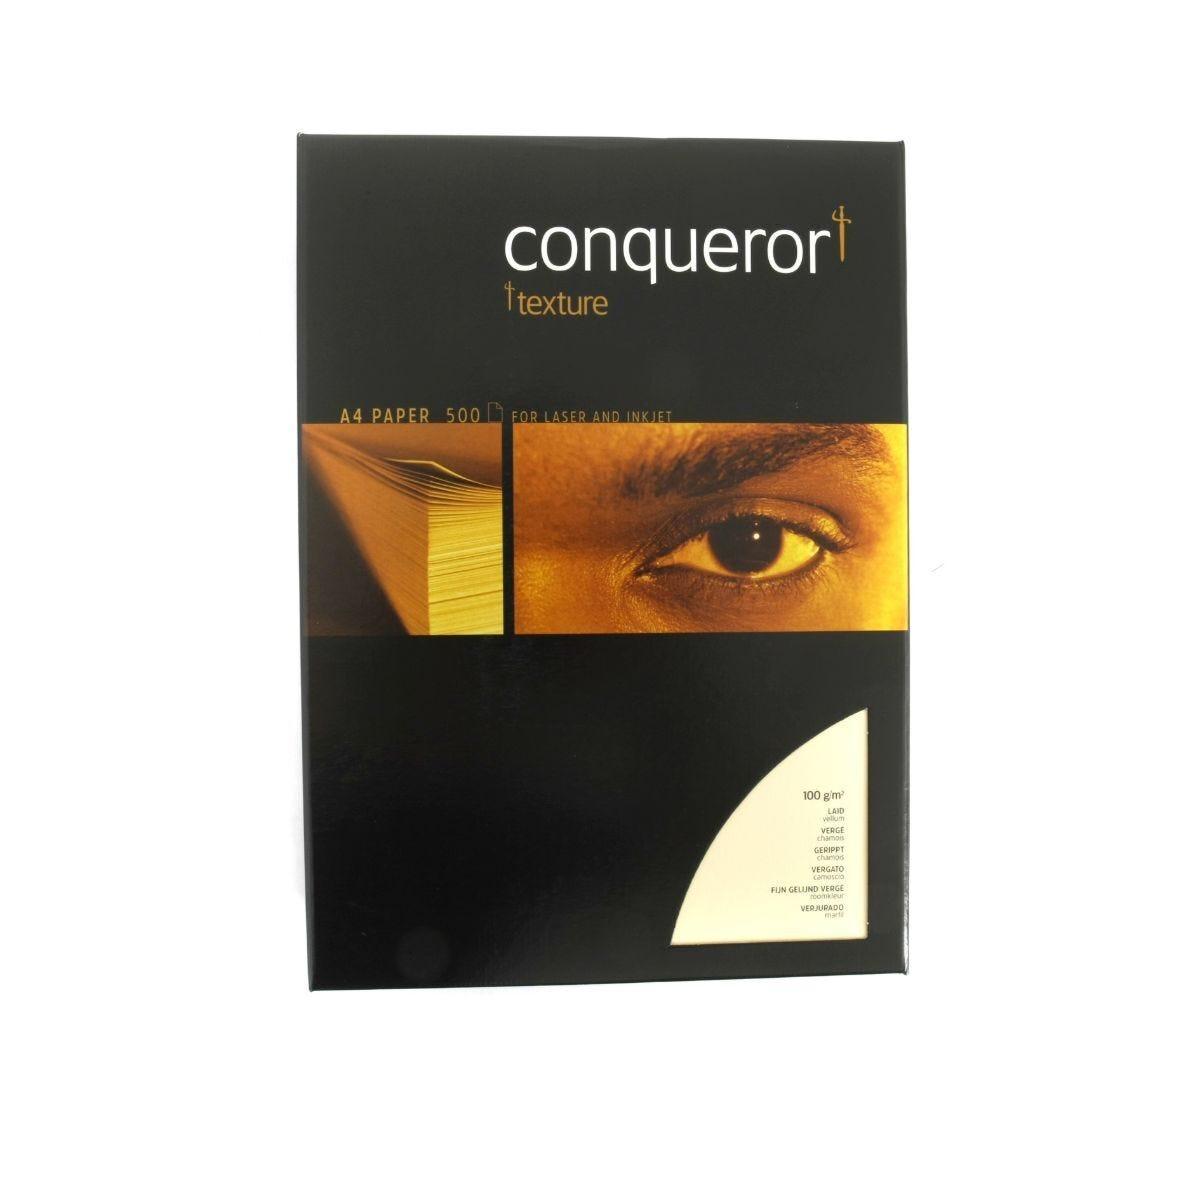 Conqueror Laid Textured Ream of Paper A4 100gsm 500 Sheets Vellum